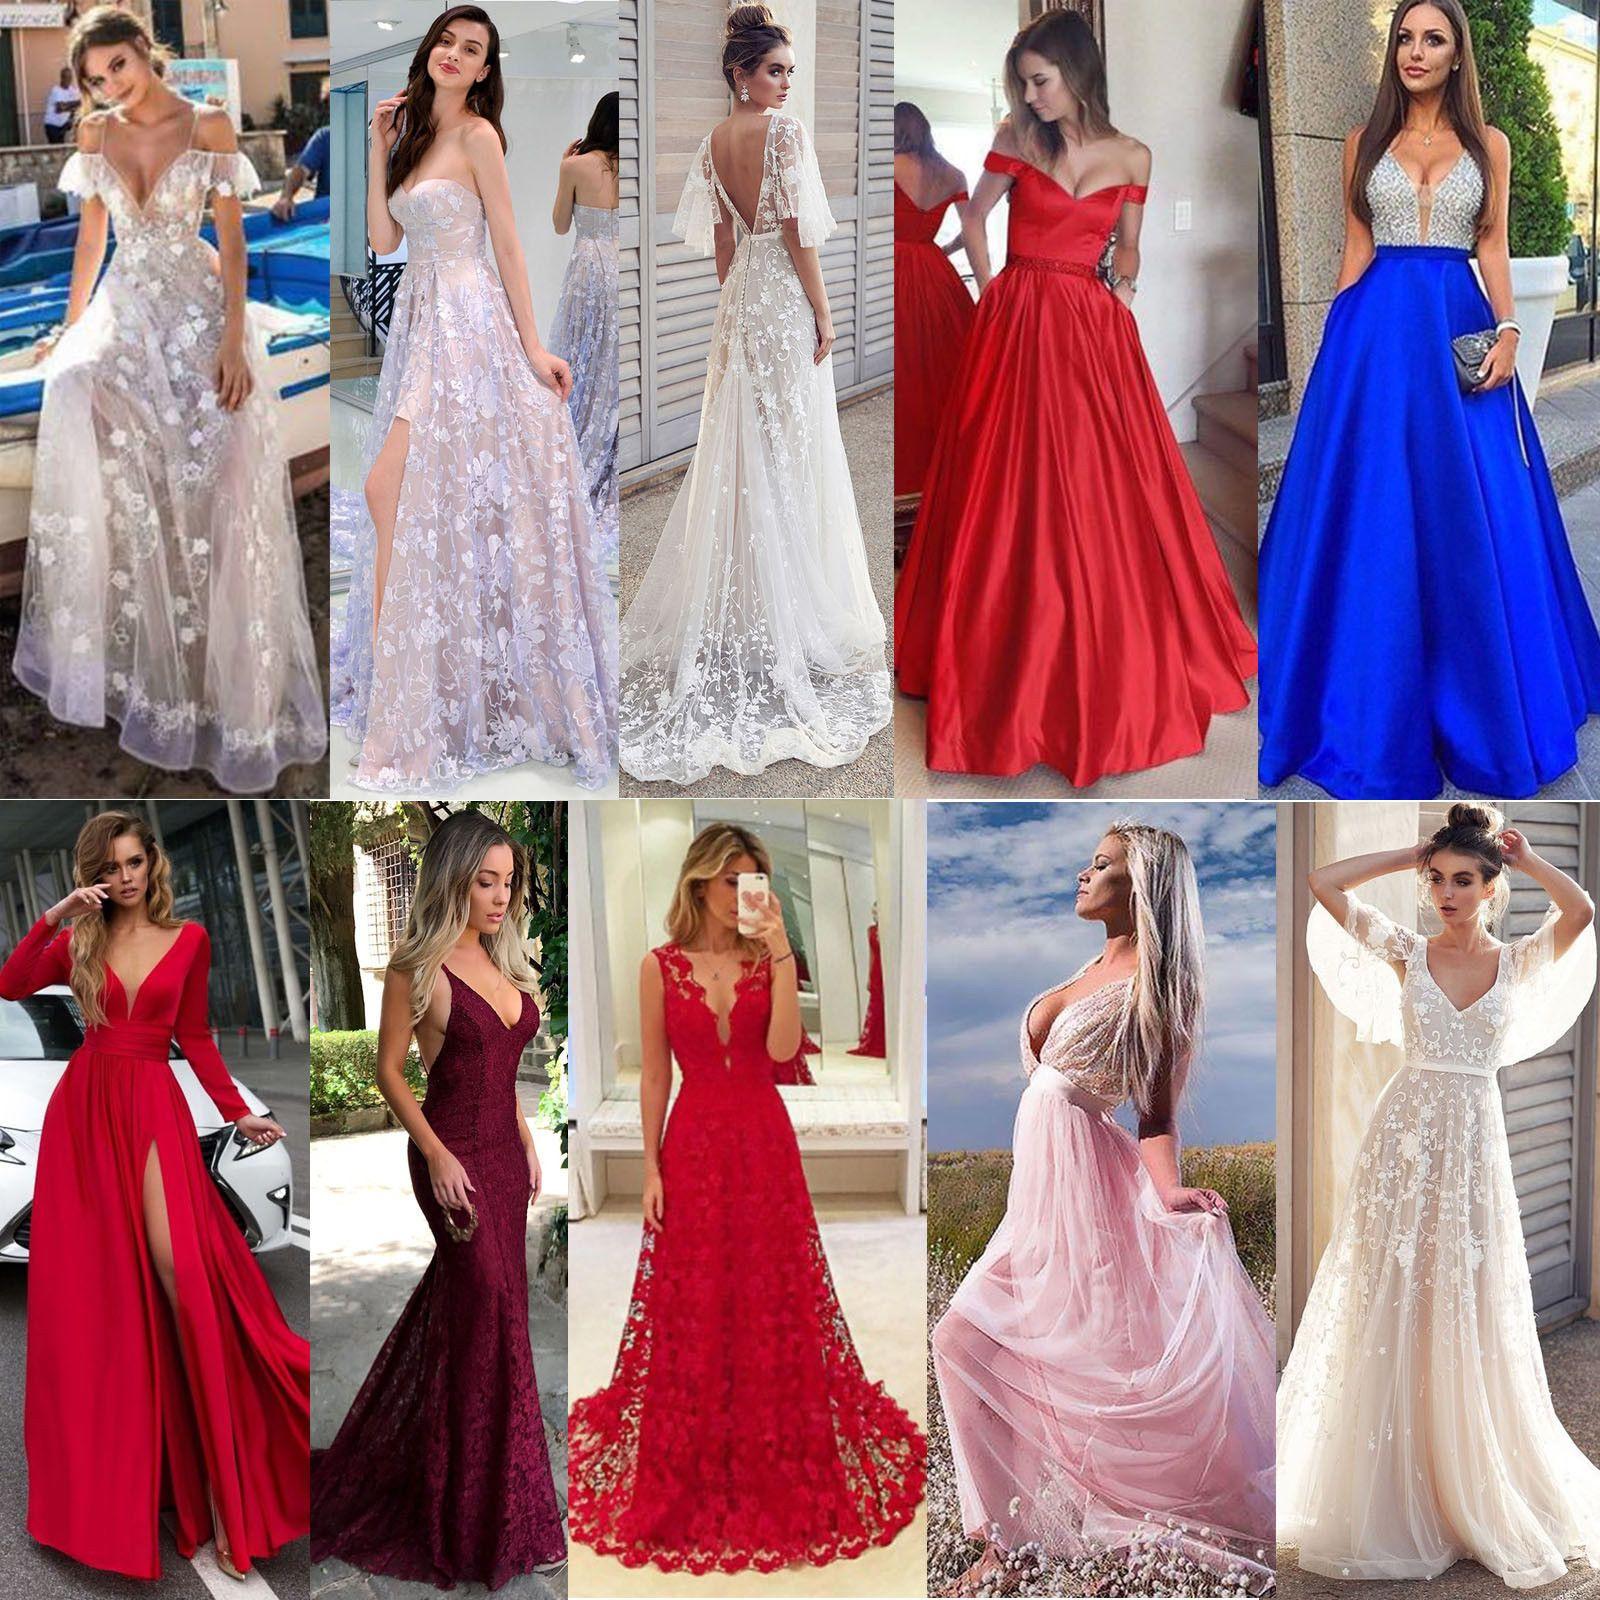 Vestiti Eleganti Cerimonia.Pin On Vestiti Eleganti Donne